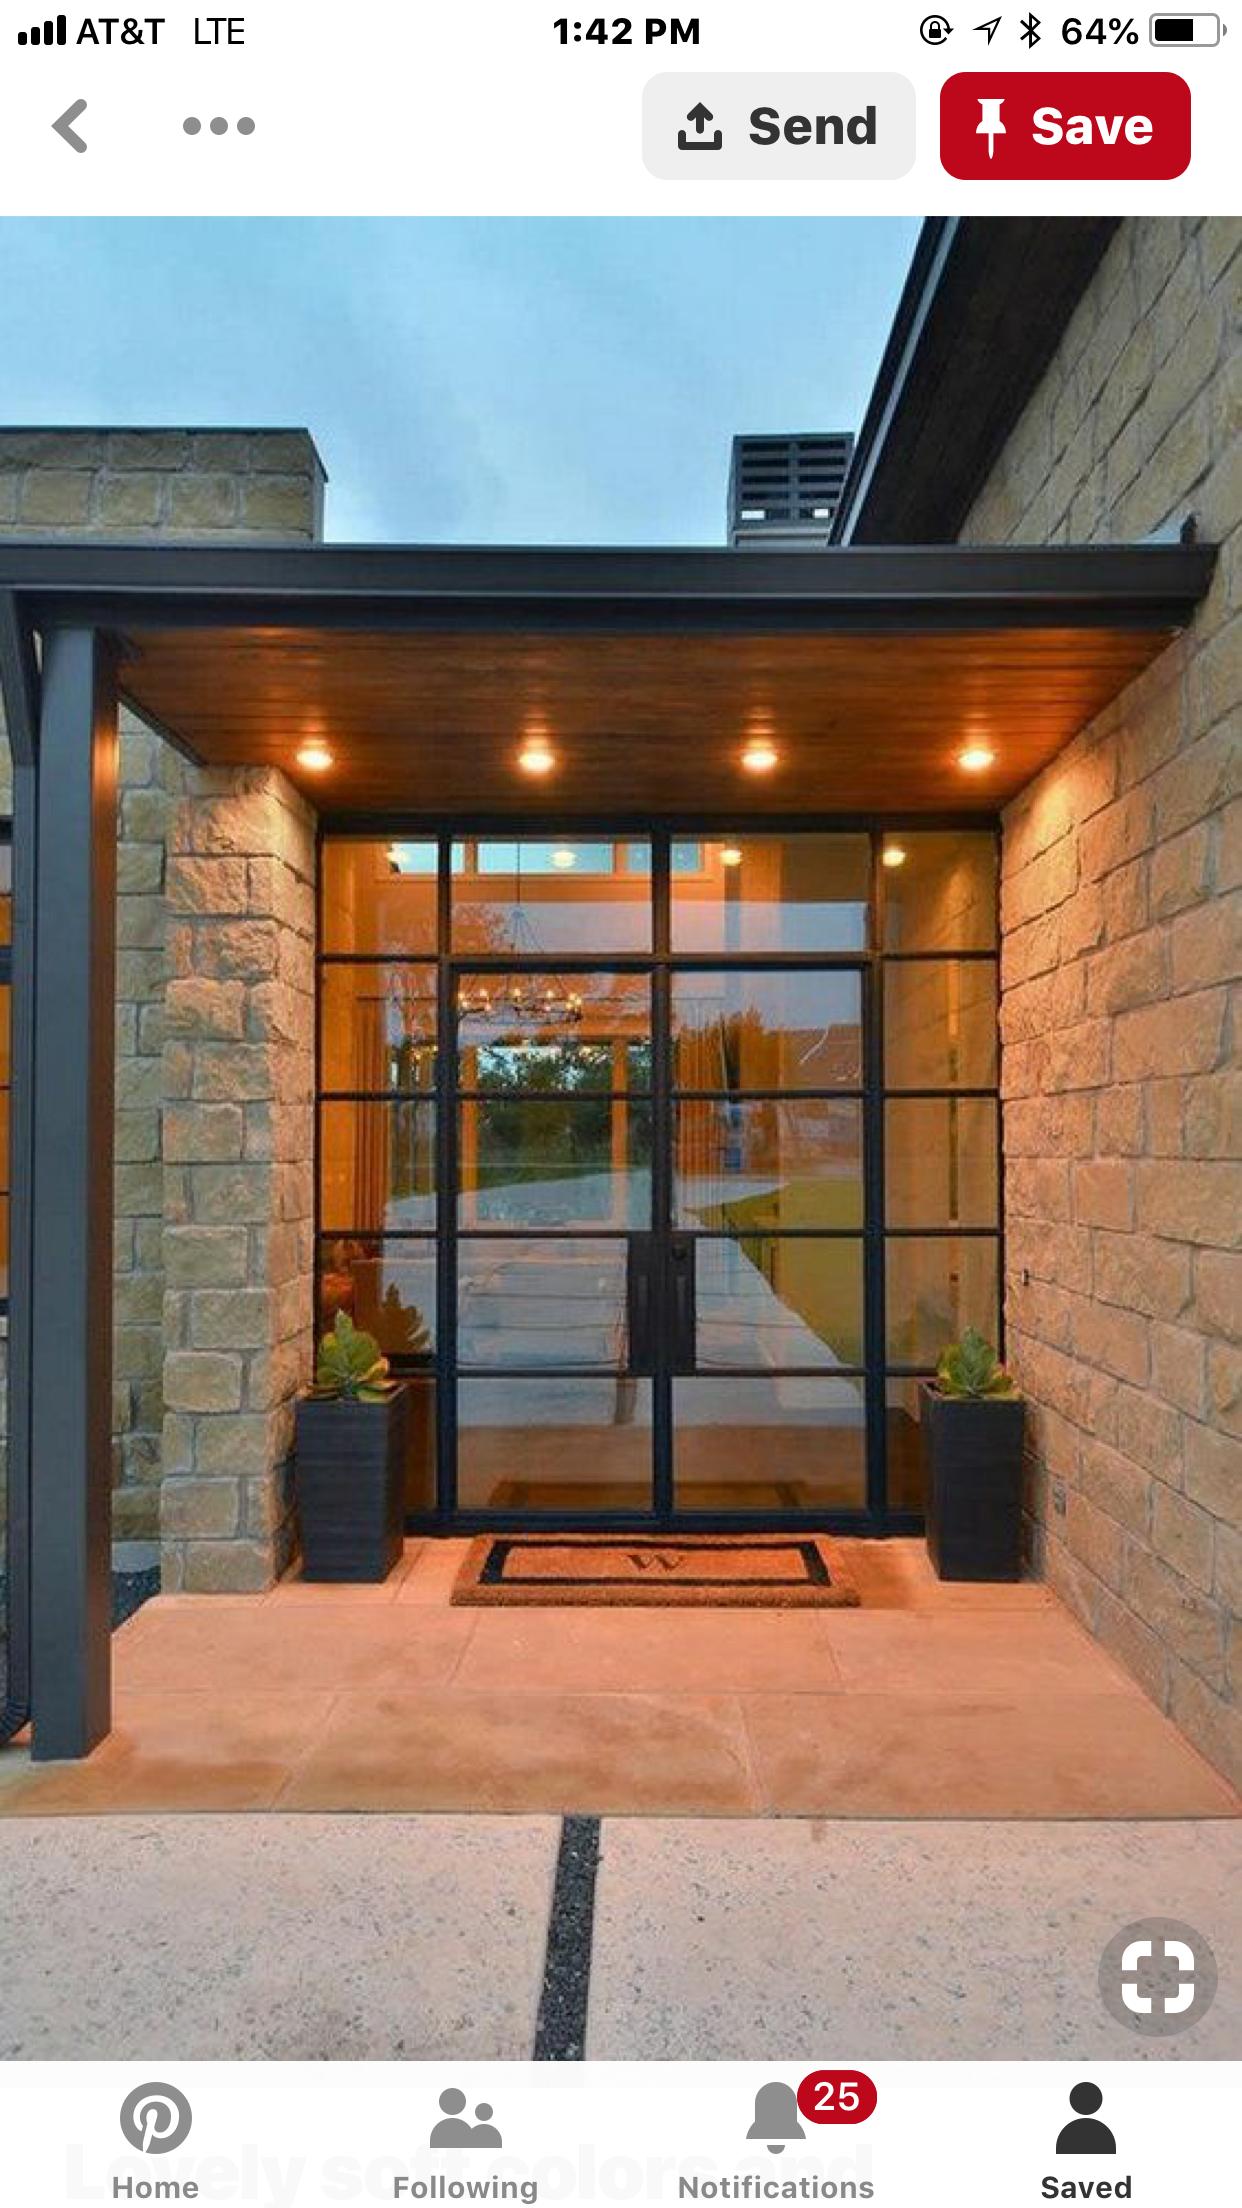 cc7869c3eaf36d2fa8fbb70543a4760d Modern Farm House Exterior Design Ideas on design accents, 3d blueprints, black trim, grey brick, color green, white stucco,